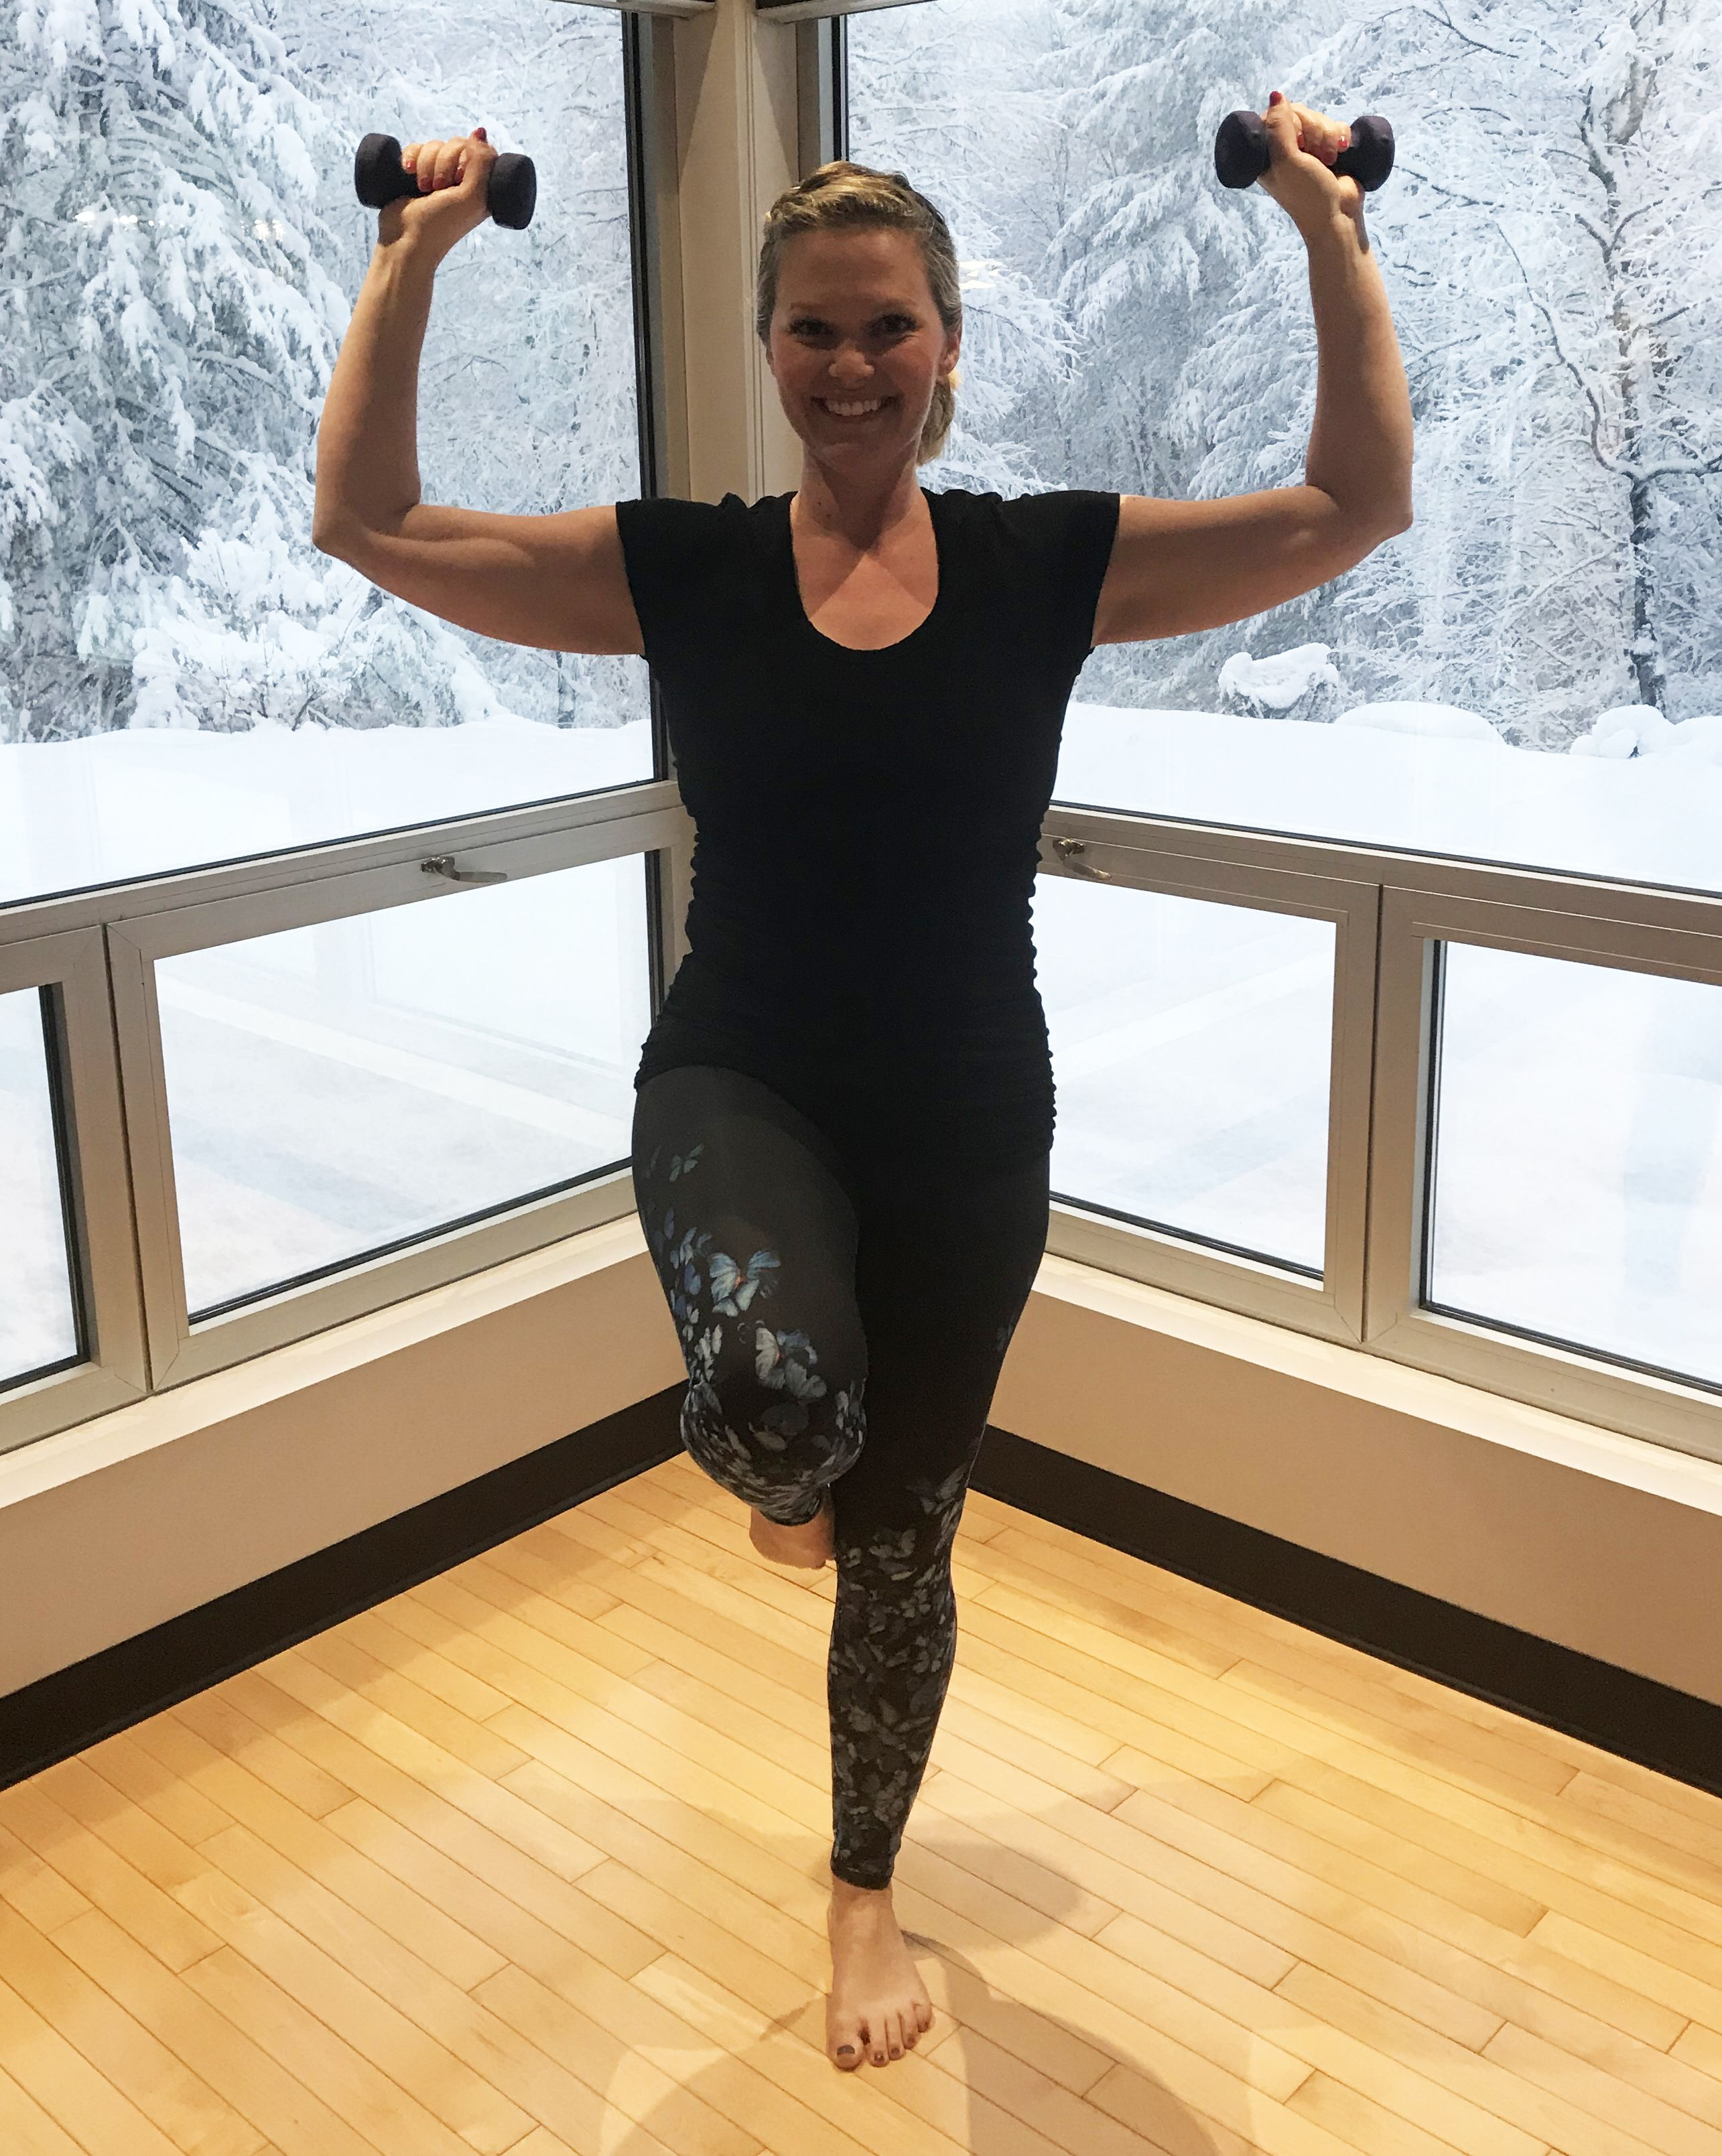 Balance with Shoulder Press